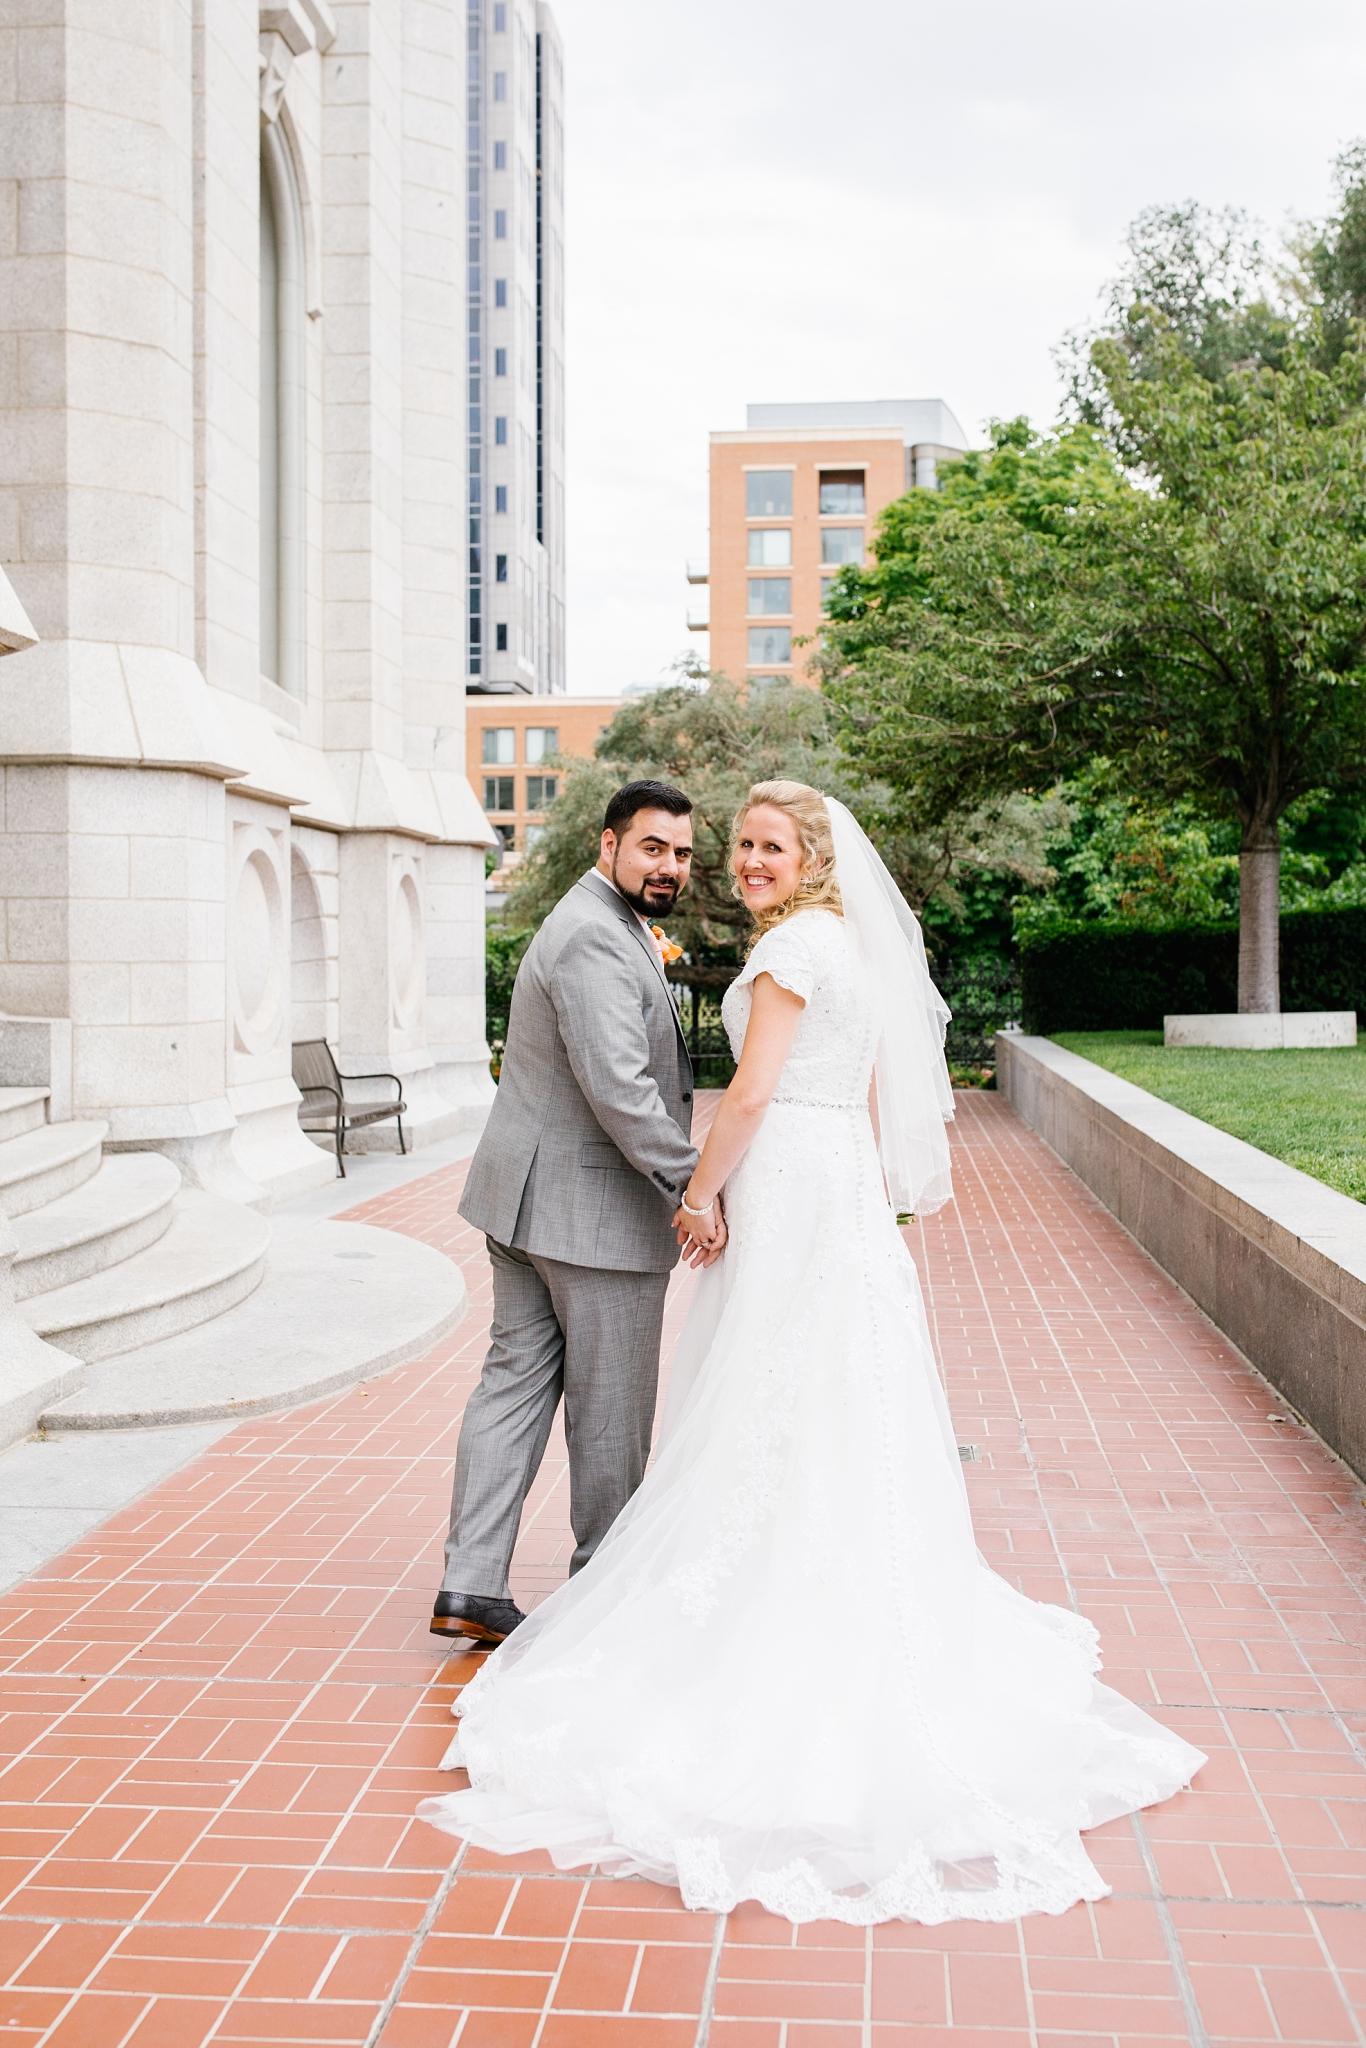 Justin and Melissa-125_Lizzie-B-Imagery-Utah-Wedding-Photographer-Salt-Lake-City-Temple-Photographer-Lion-House-Luncheon-The-Grand-Ballroom-Bountiful.jpg